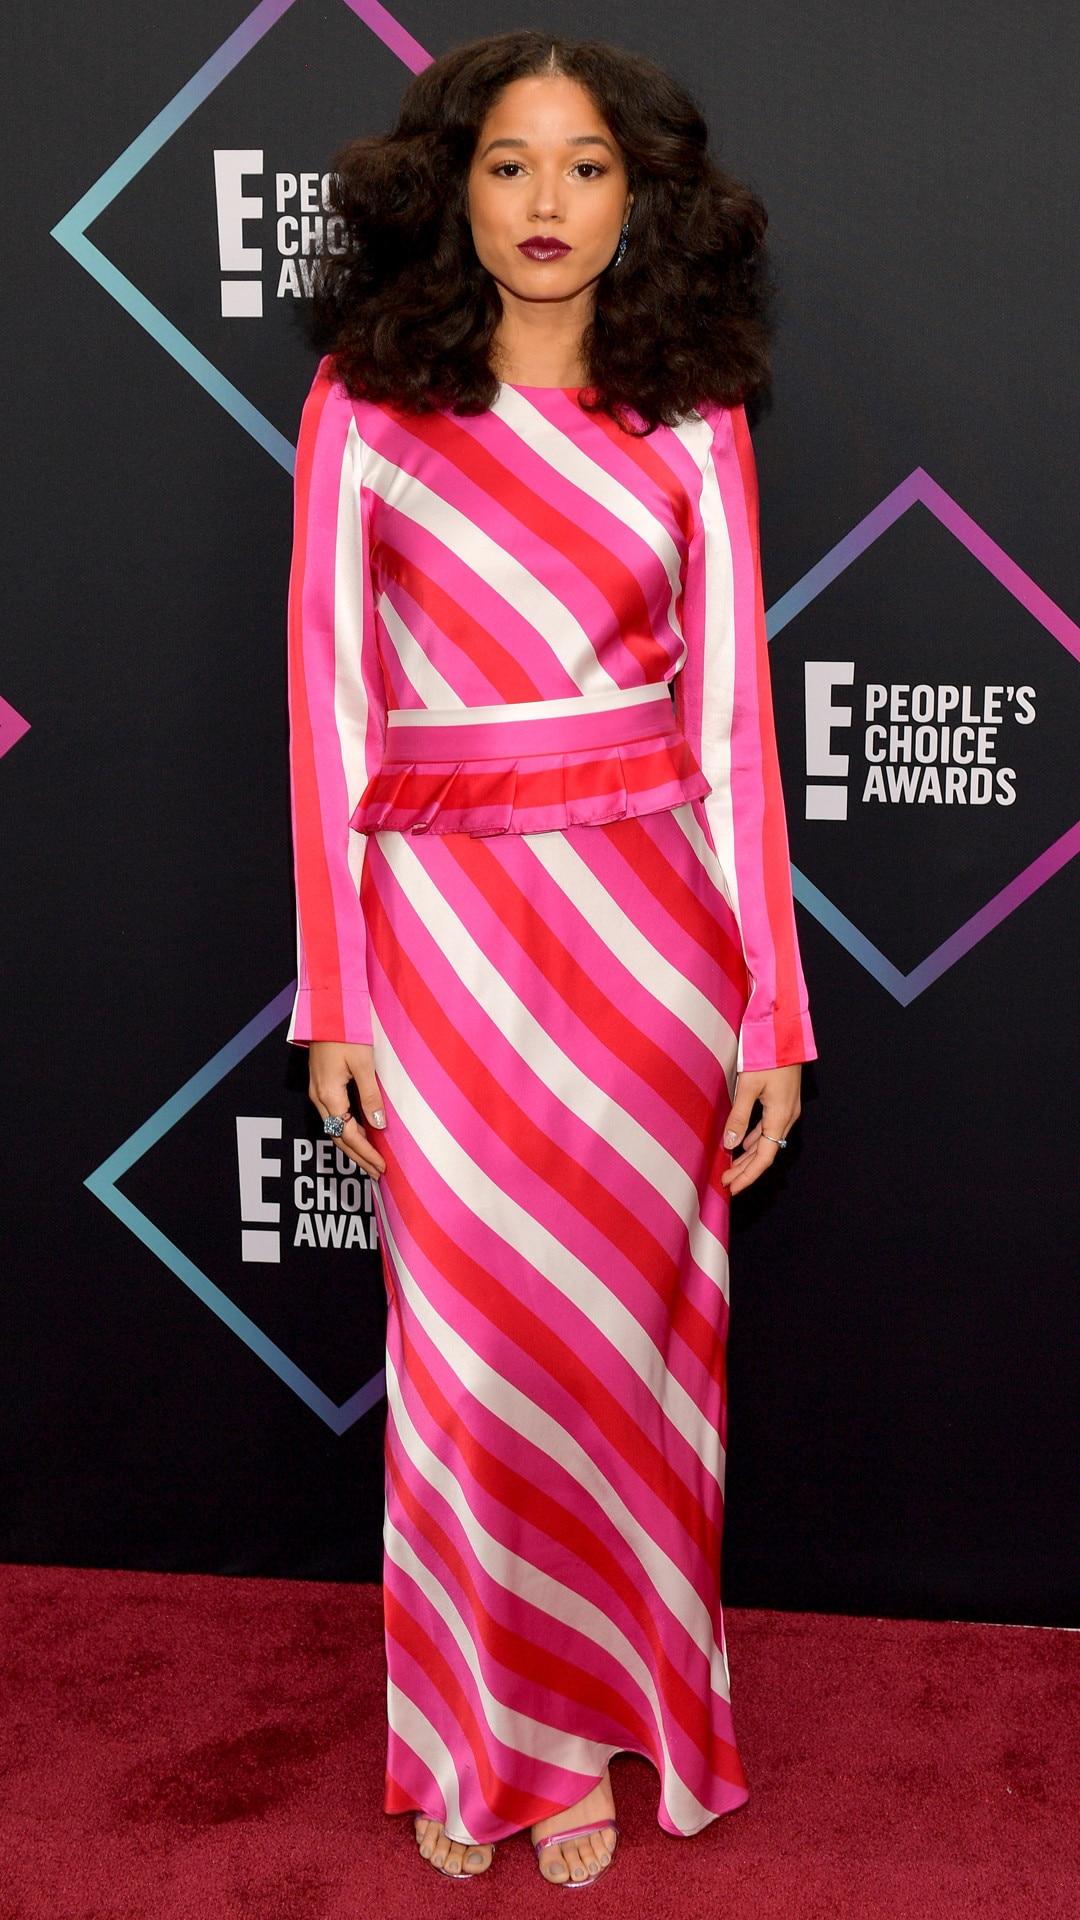 Alisha Wainwright, 2018 Peoples Choice Awards, PCAs, Red Carpet Fashions